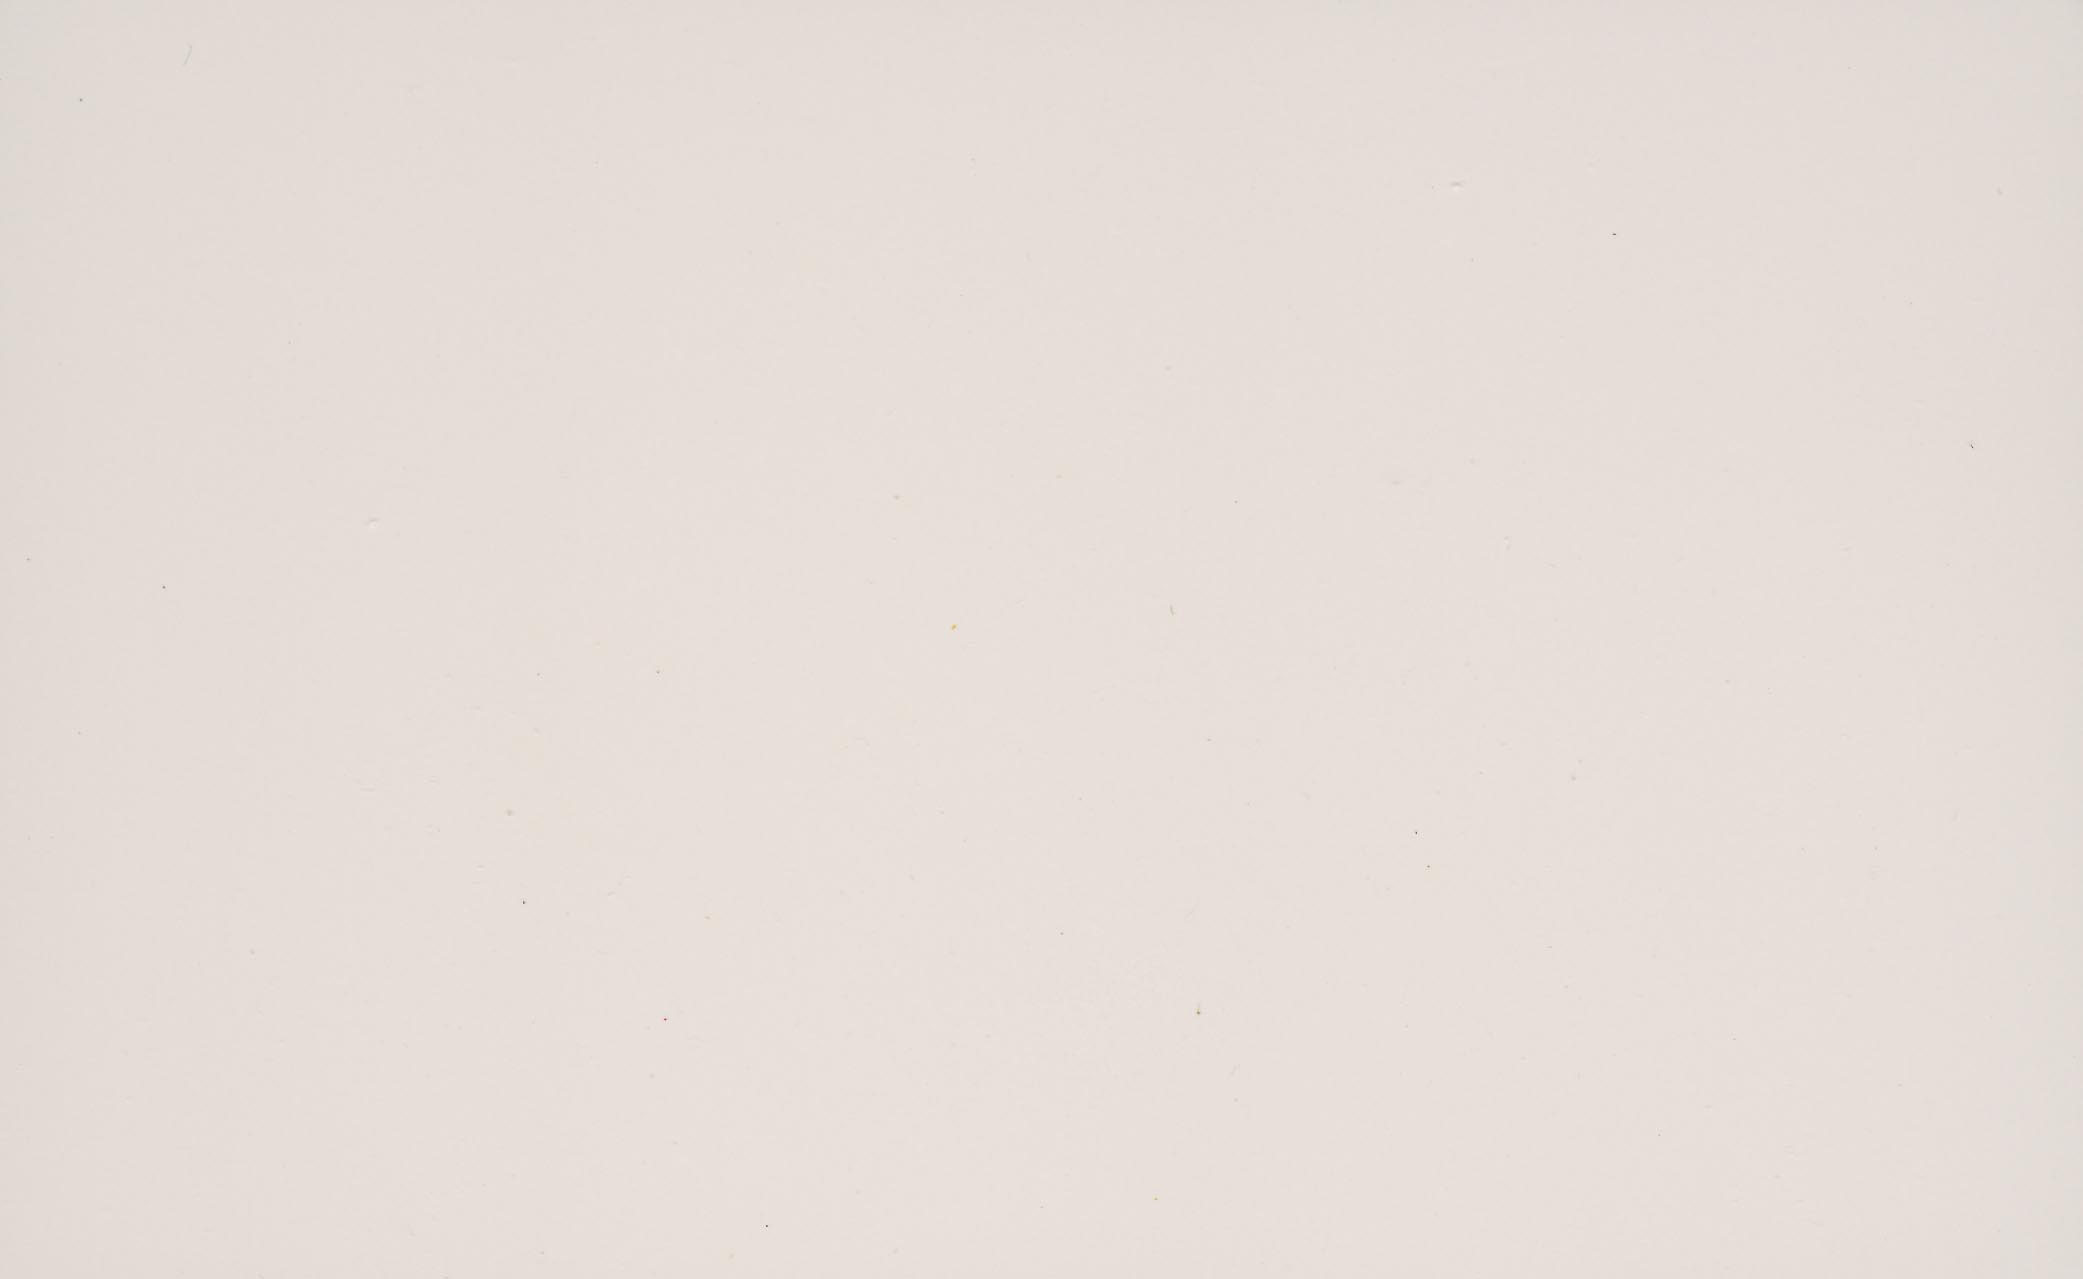 Solid gray wallpaper wallpapersafari - Gray background images ...